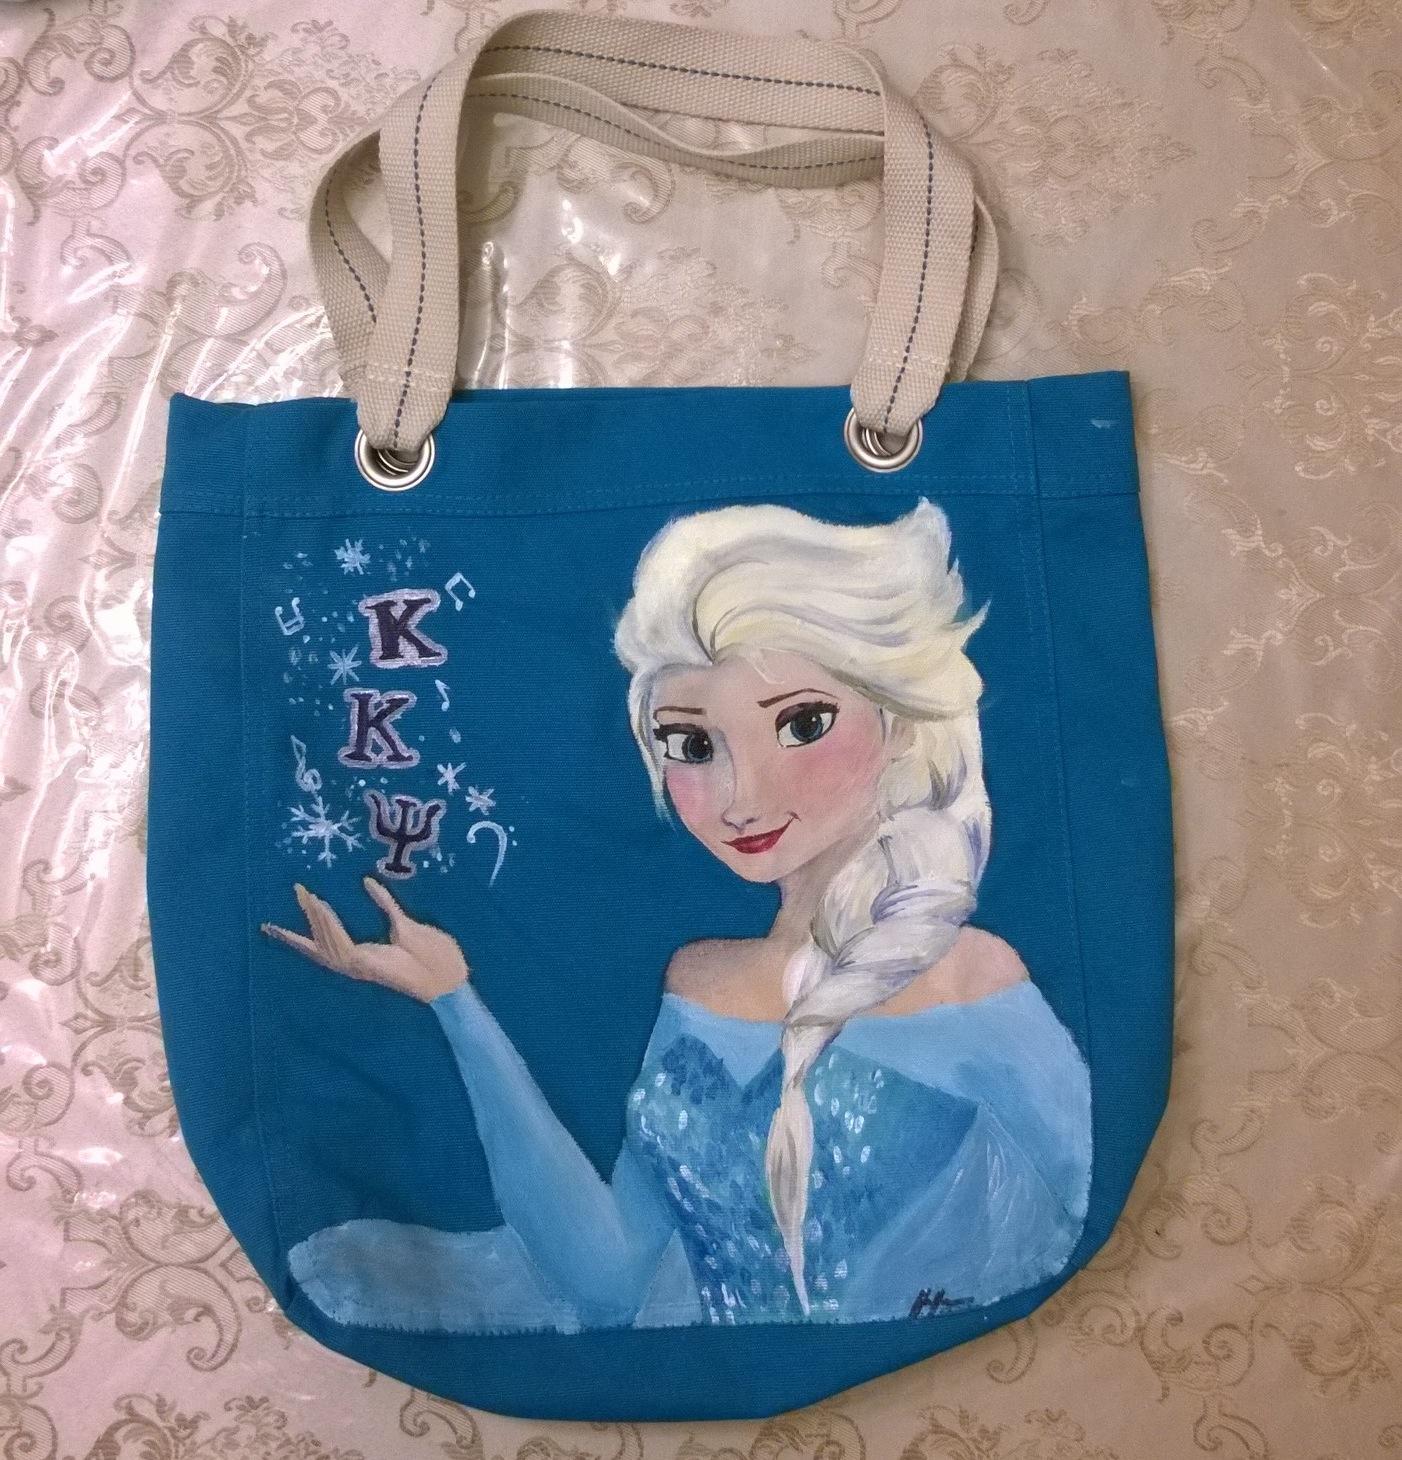 Kappa Kappa Psi/Elsa bag Side 2 by songbirdholly